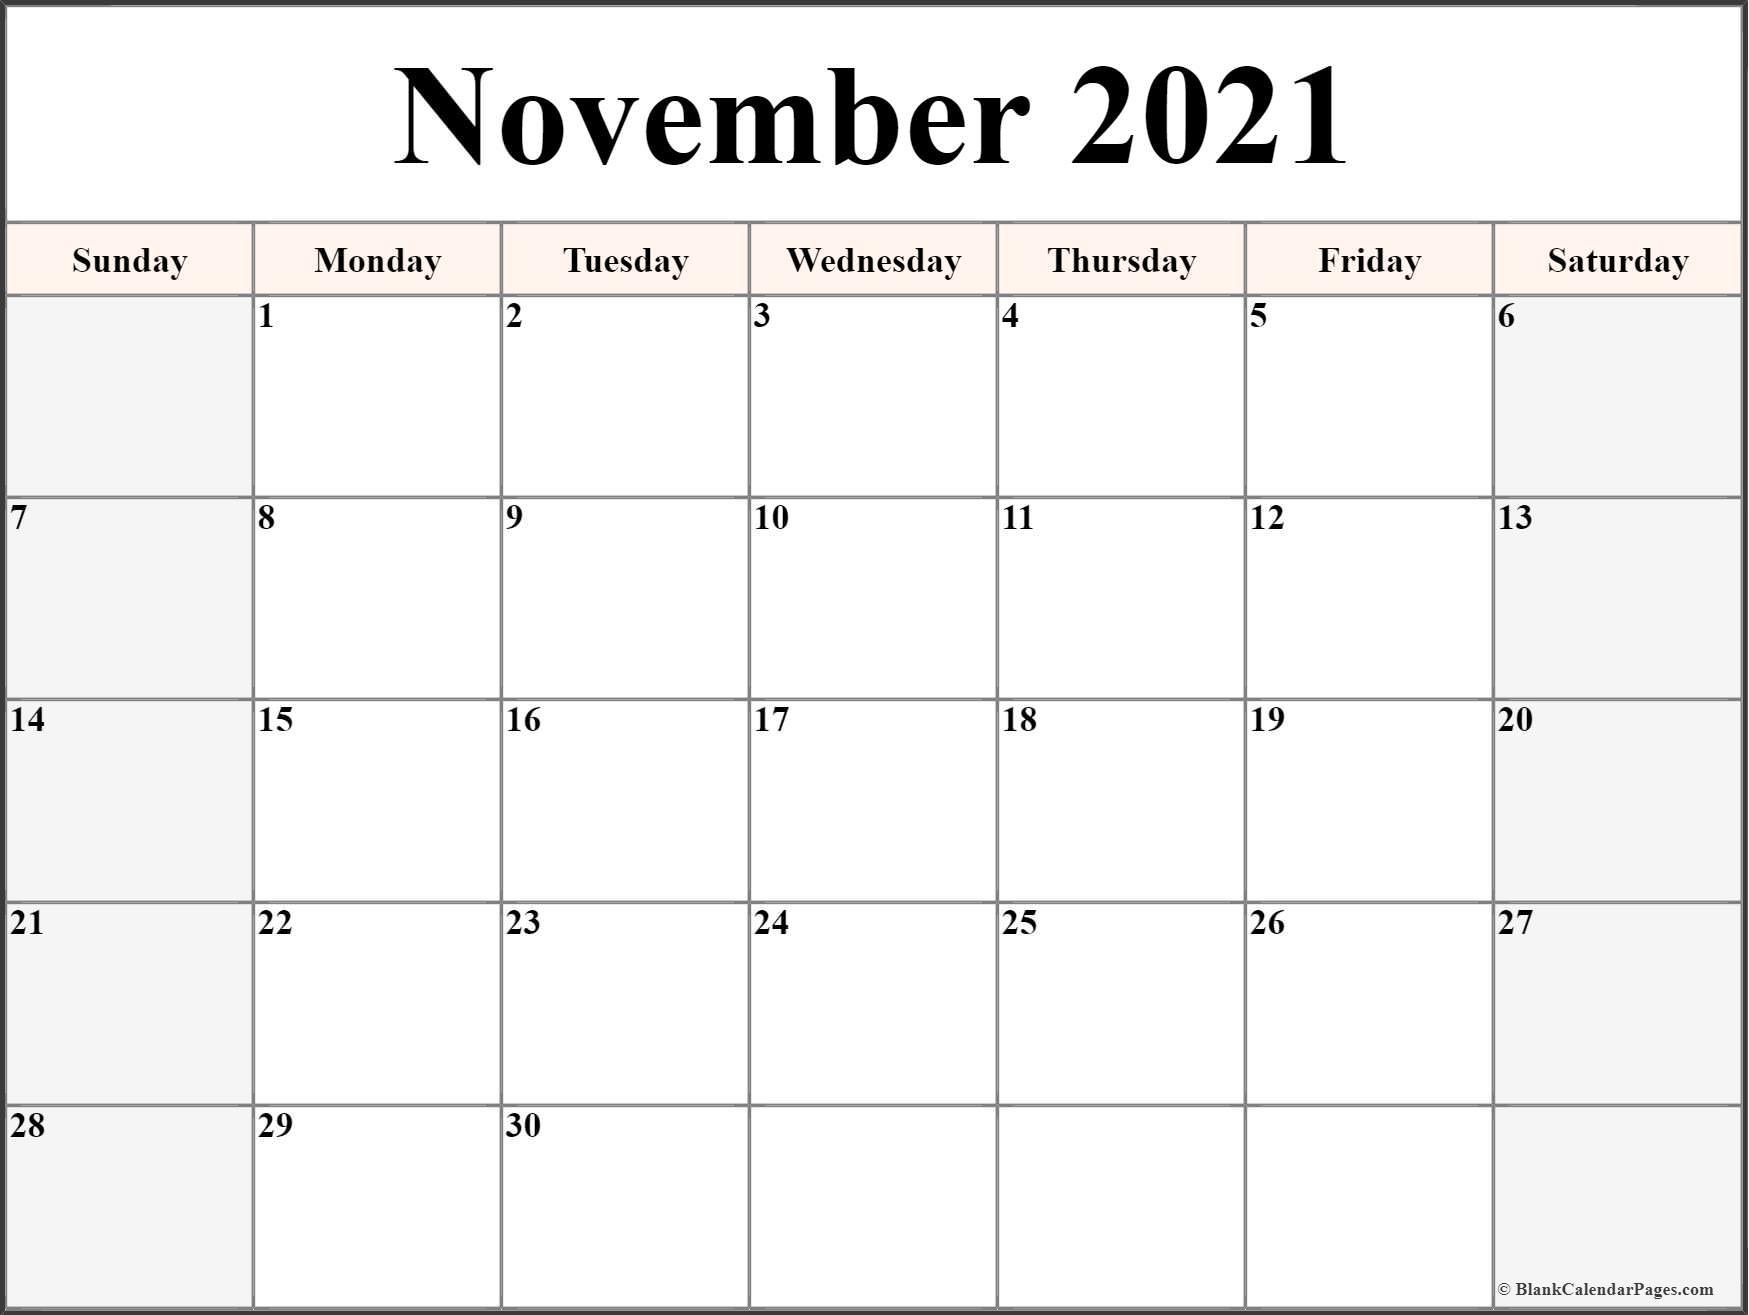 November 2021 Calendar | Free Printable Monthly Calendars Inside Calendar With November 2021 Mexican Names